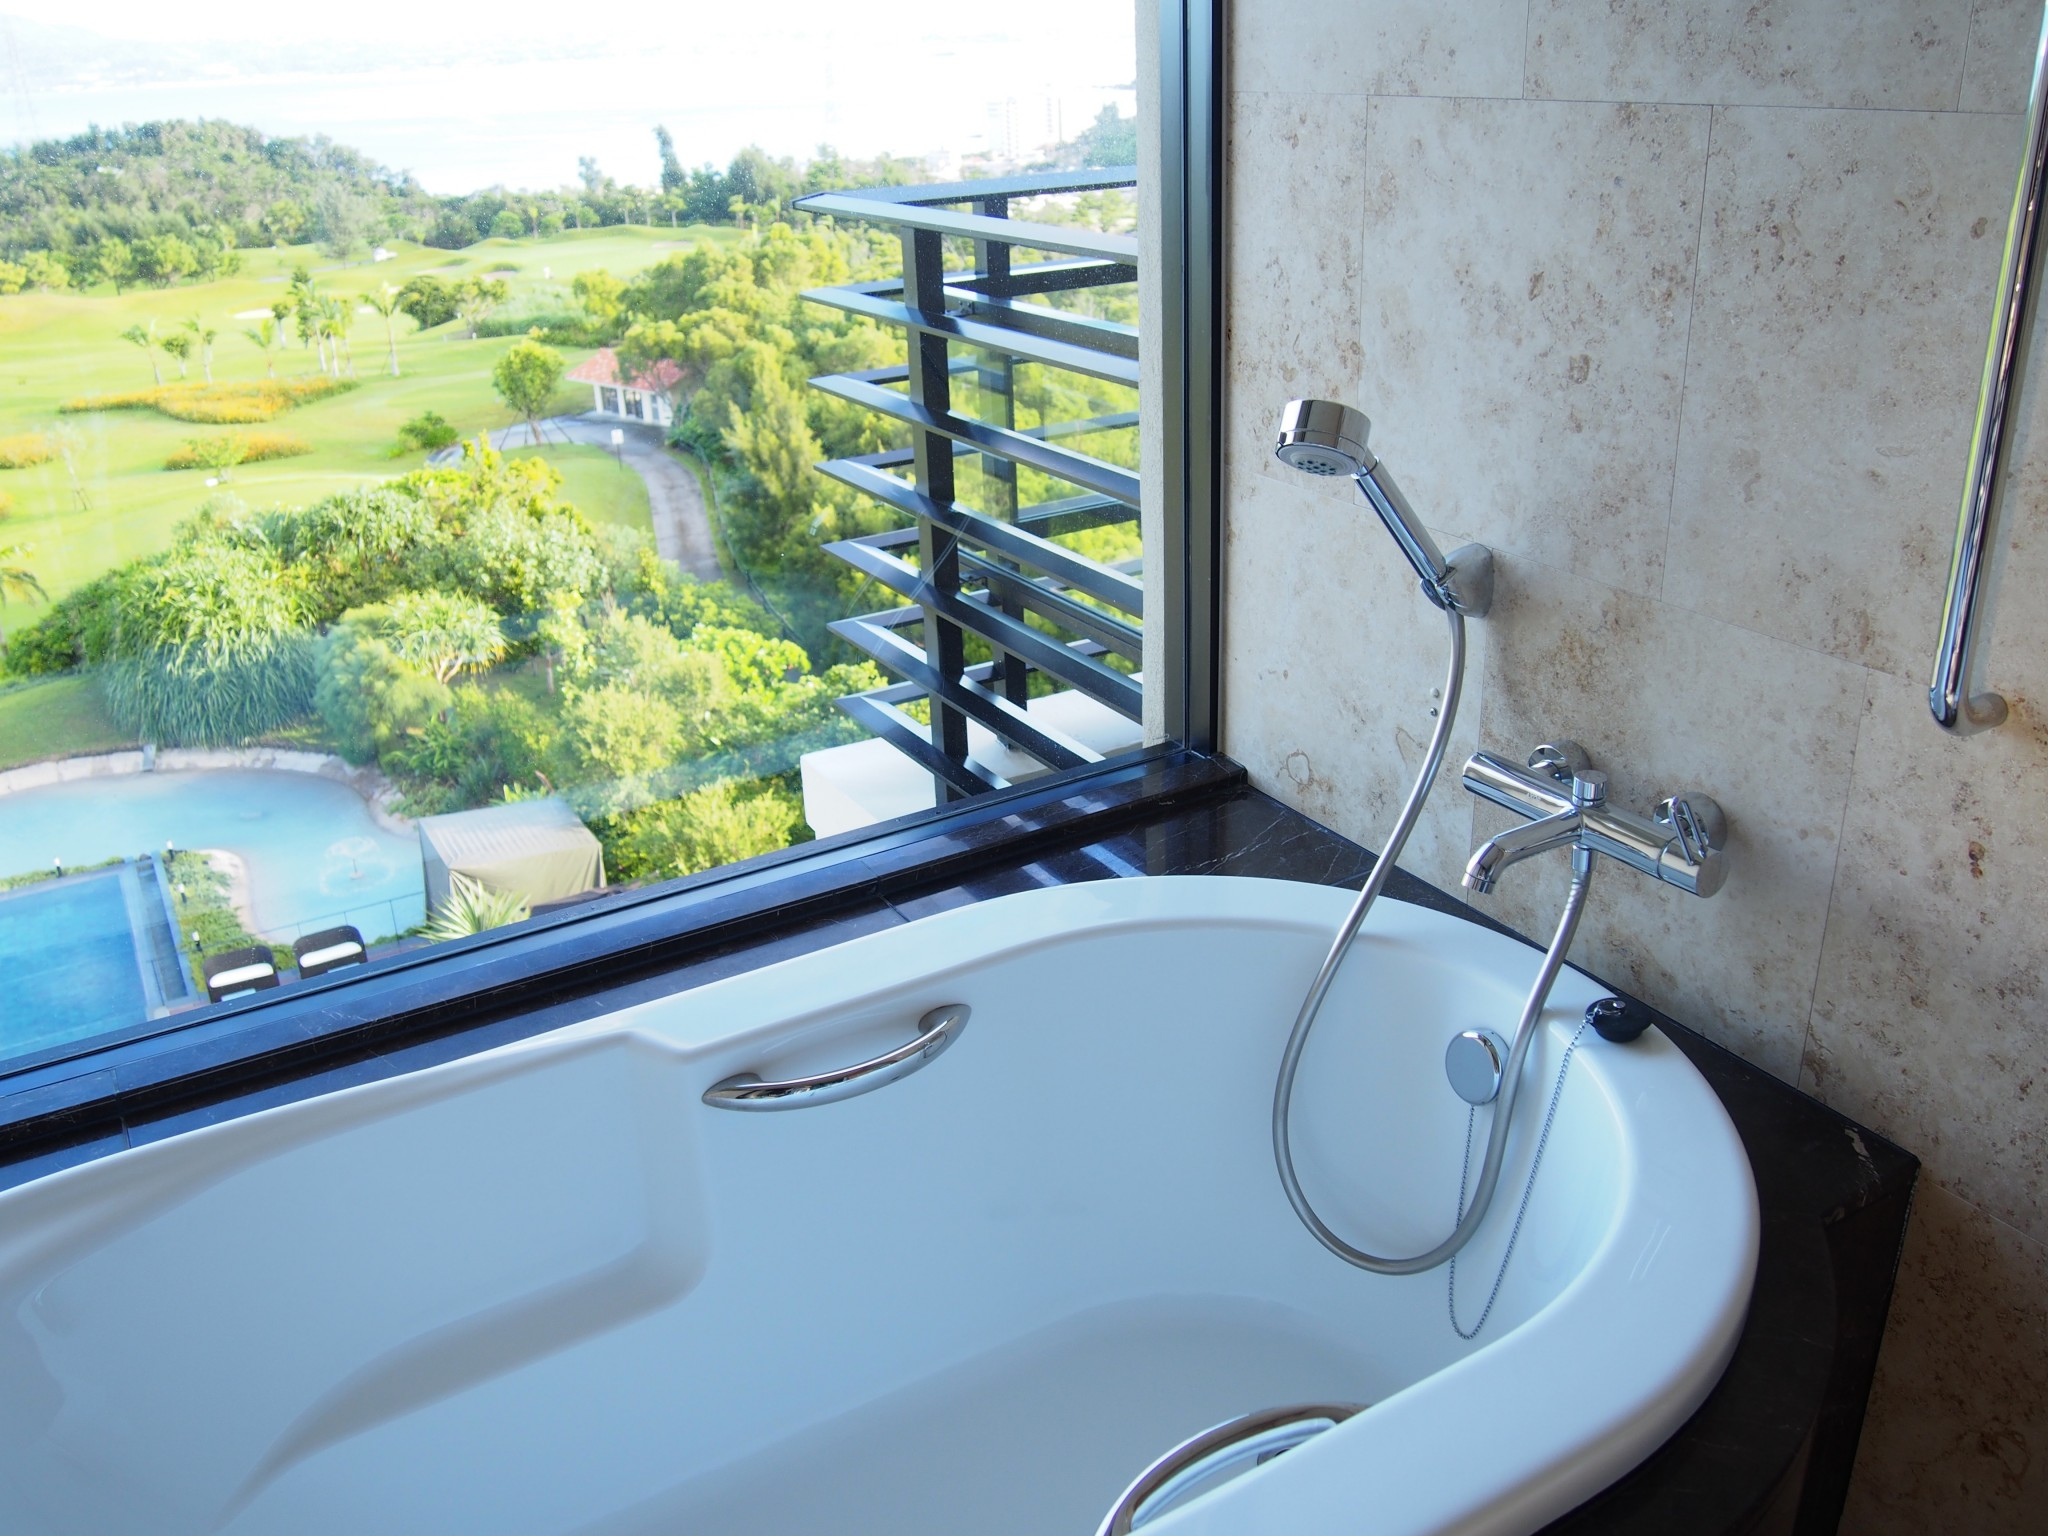 Ritz-Carlton Okinawa kylpyamme 3